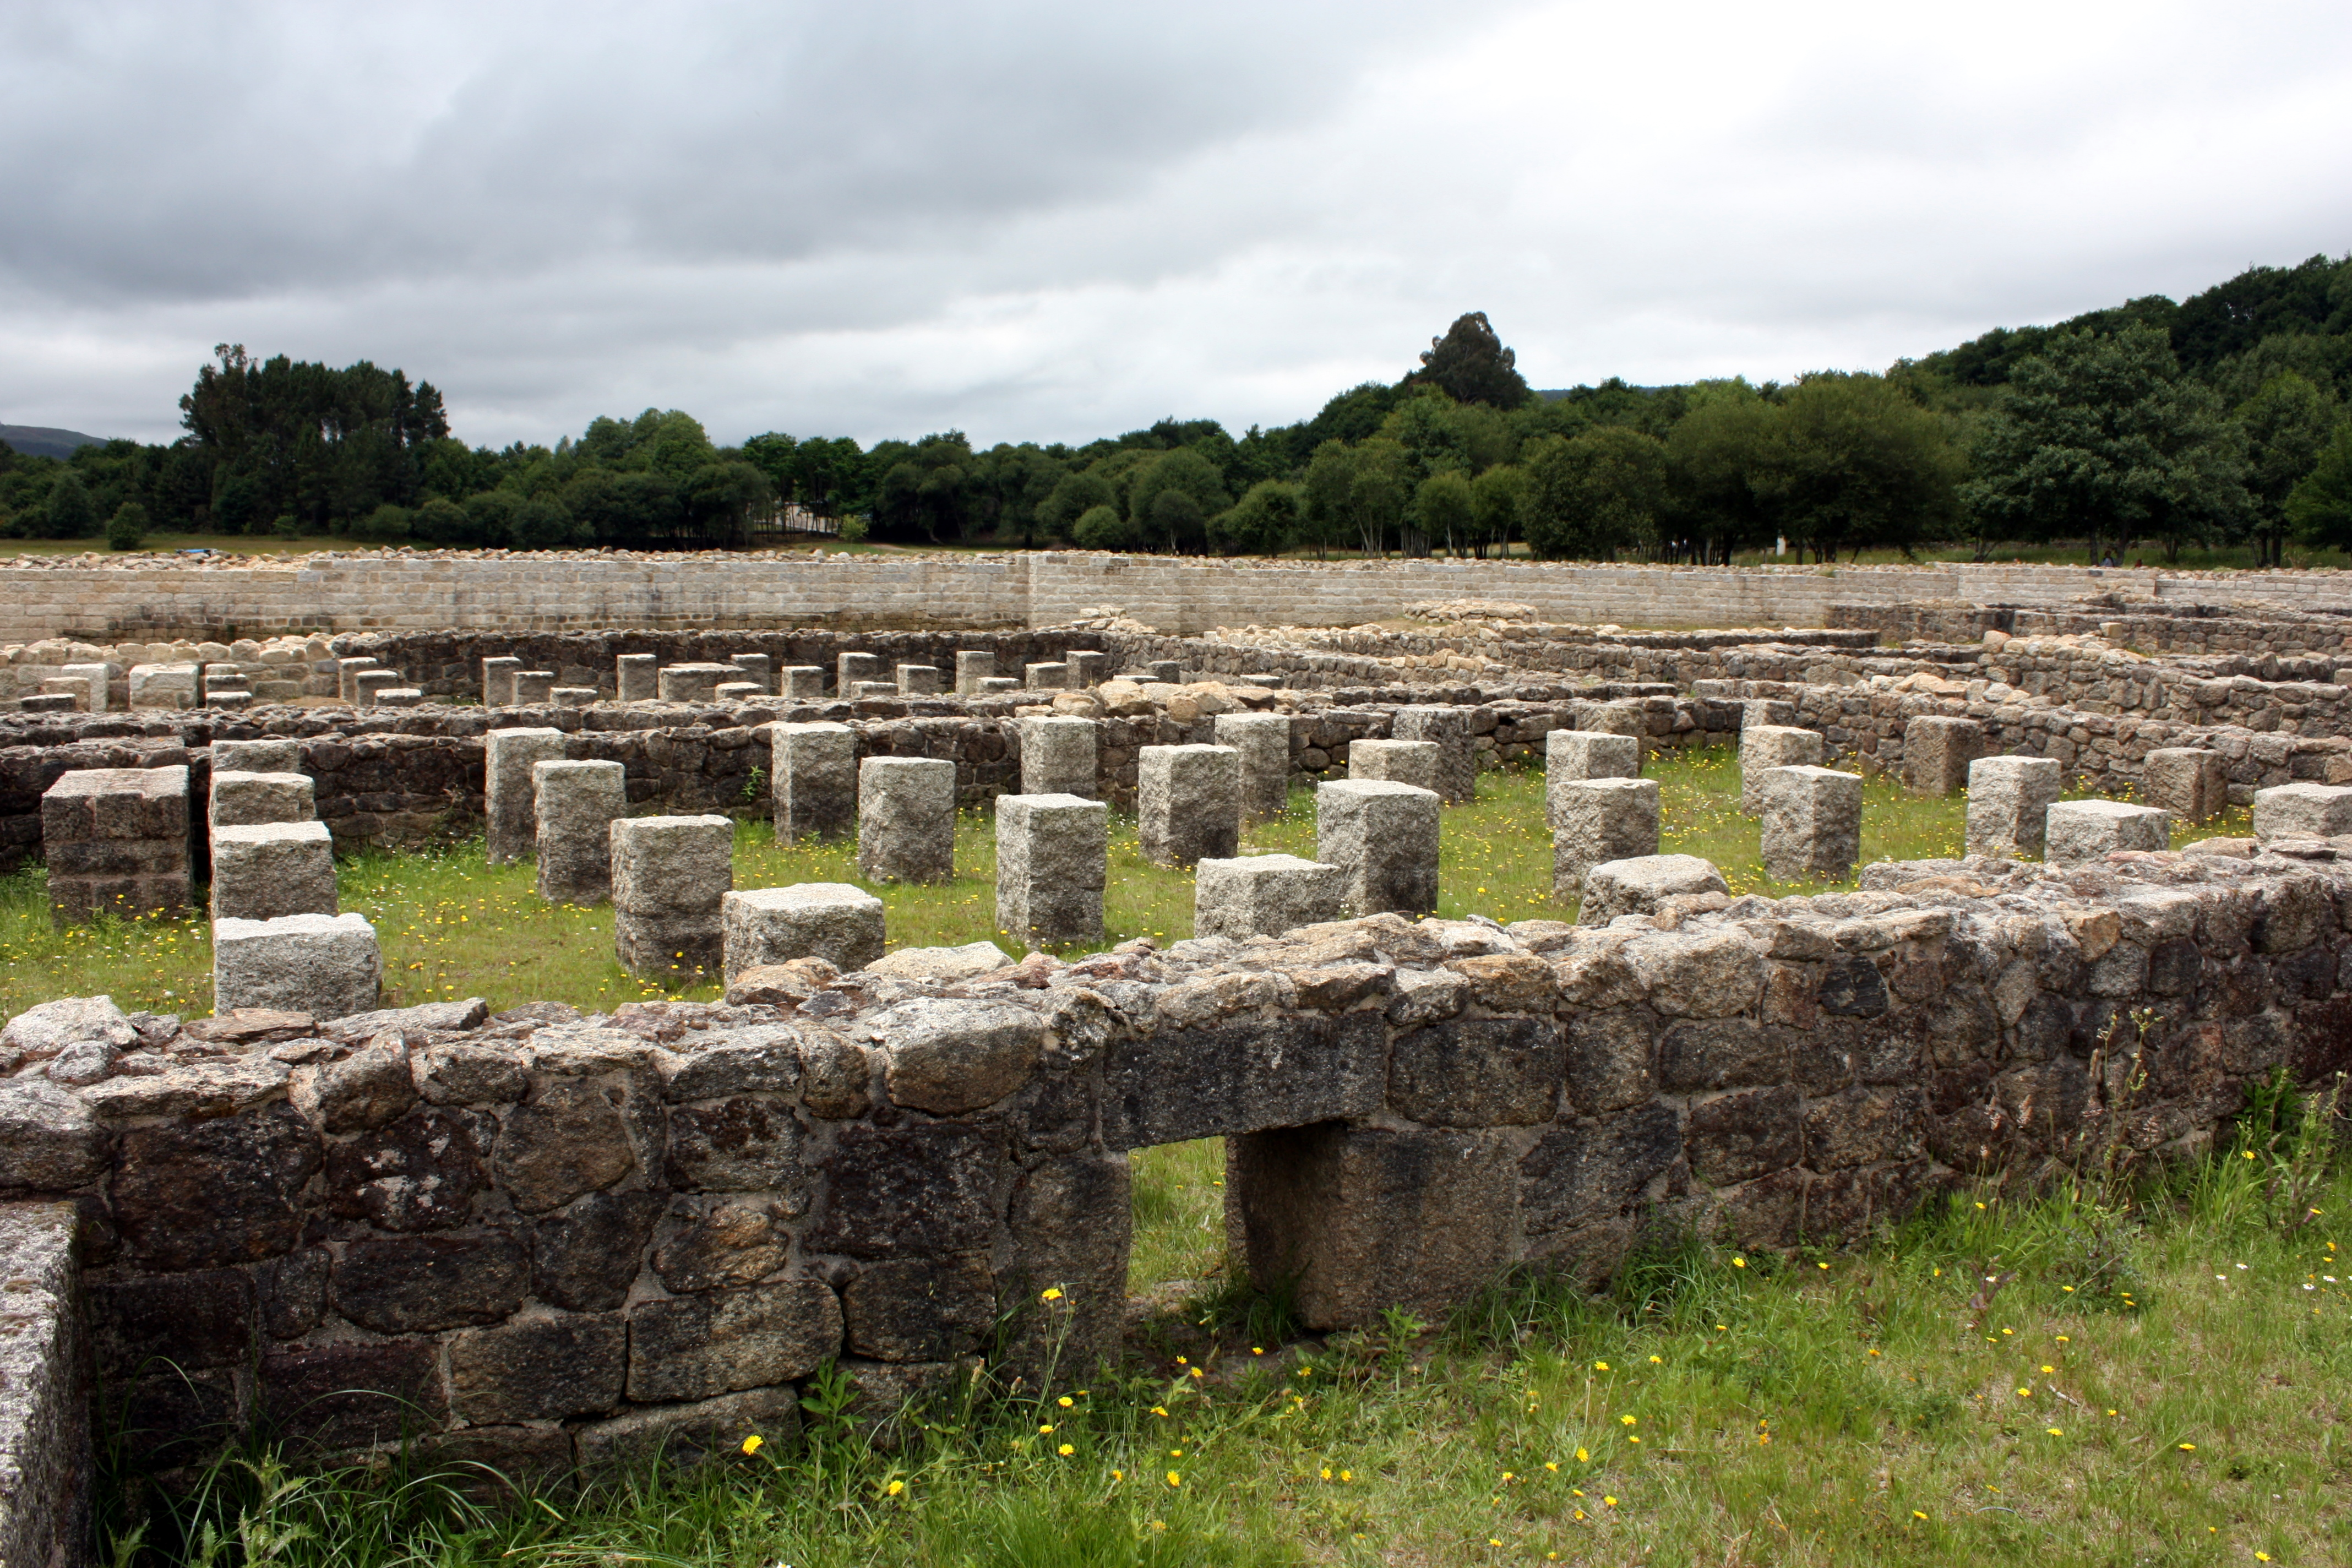 Delightful File:Roman Camp Aquis Querquennis, Baños De Bande, Ourense, Galicia 28